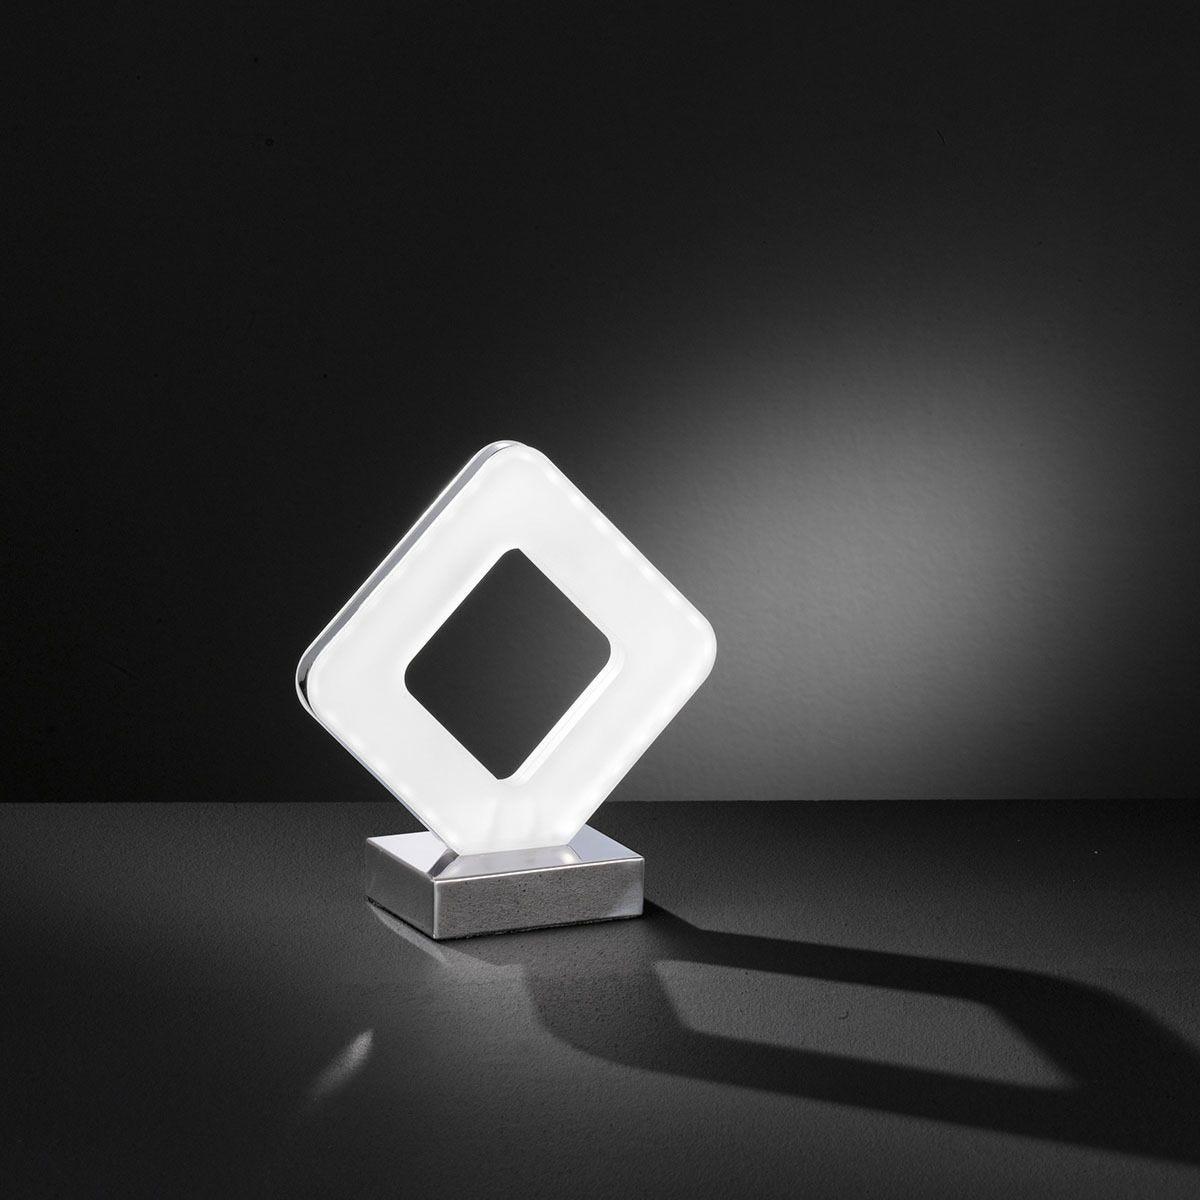 Action Pori LED Table Lamp - Chrome